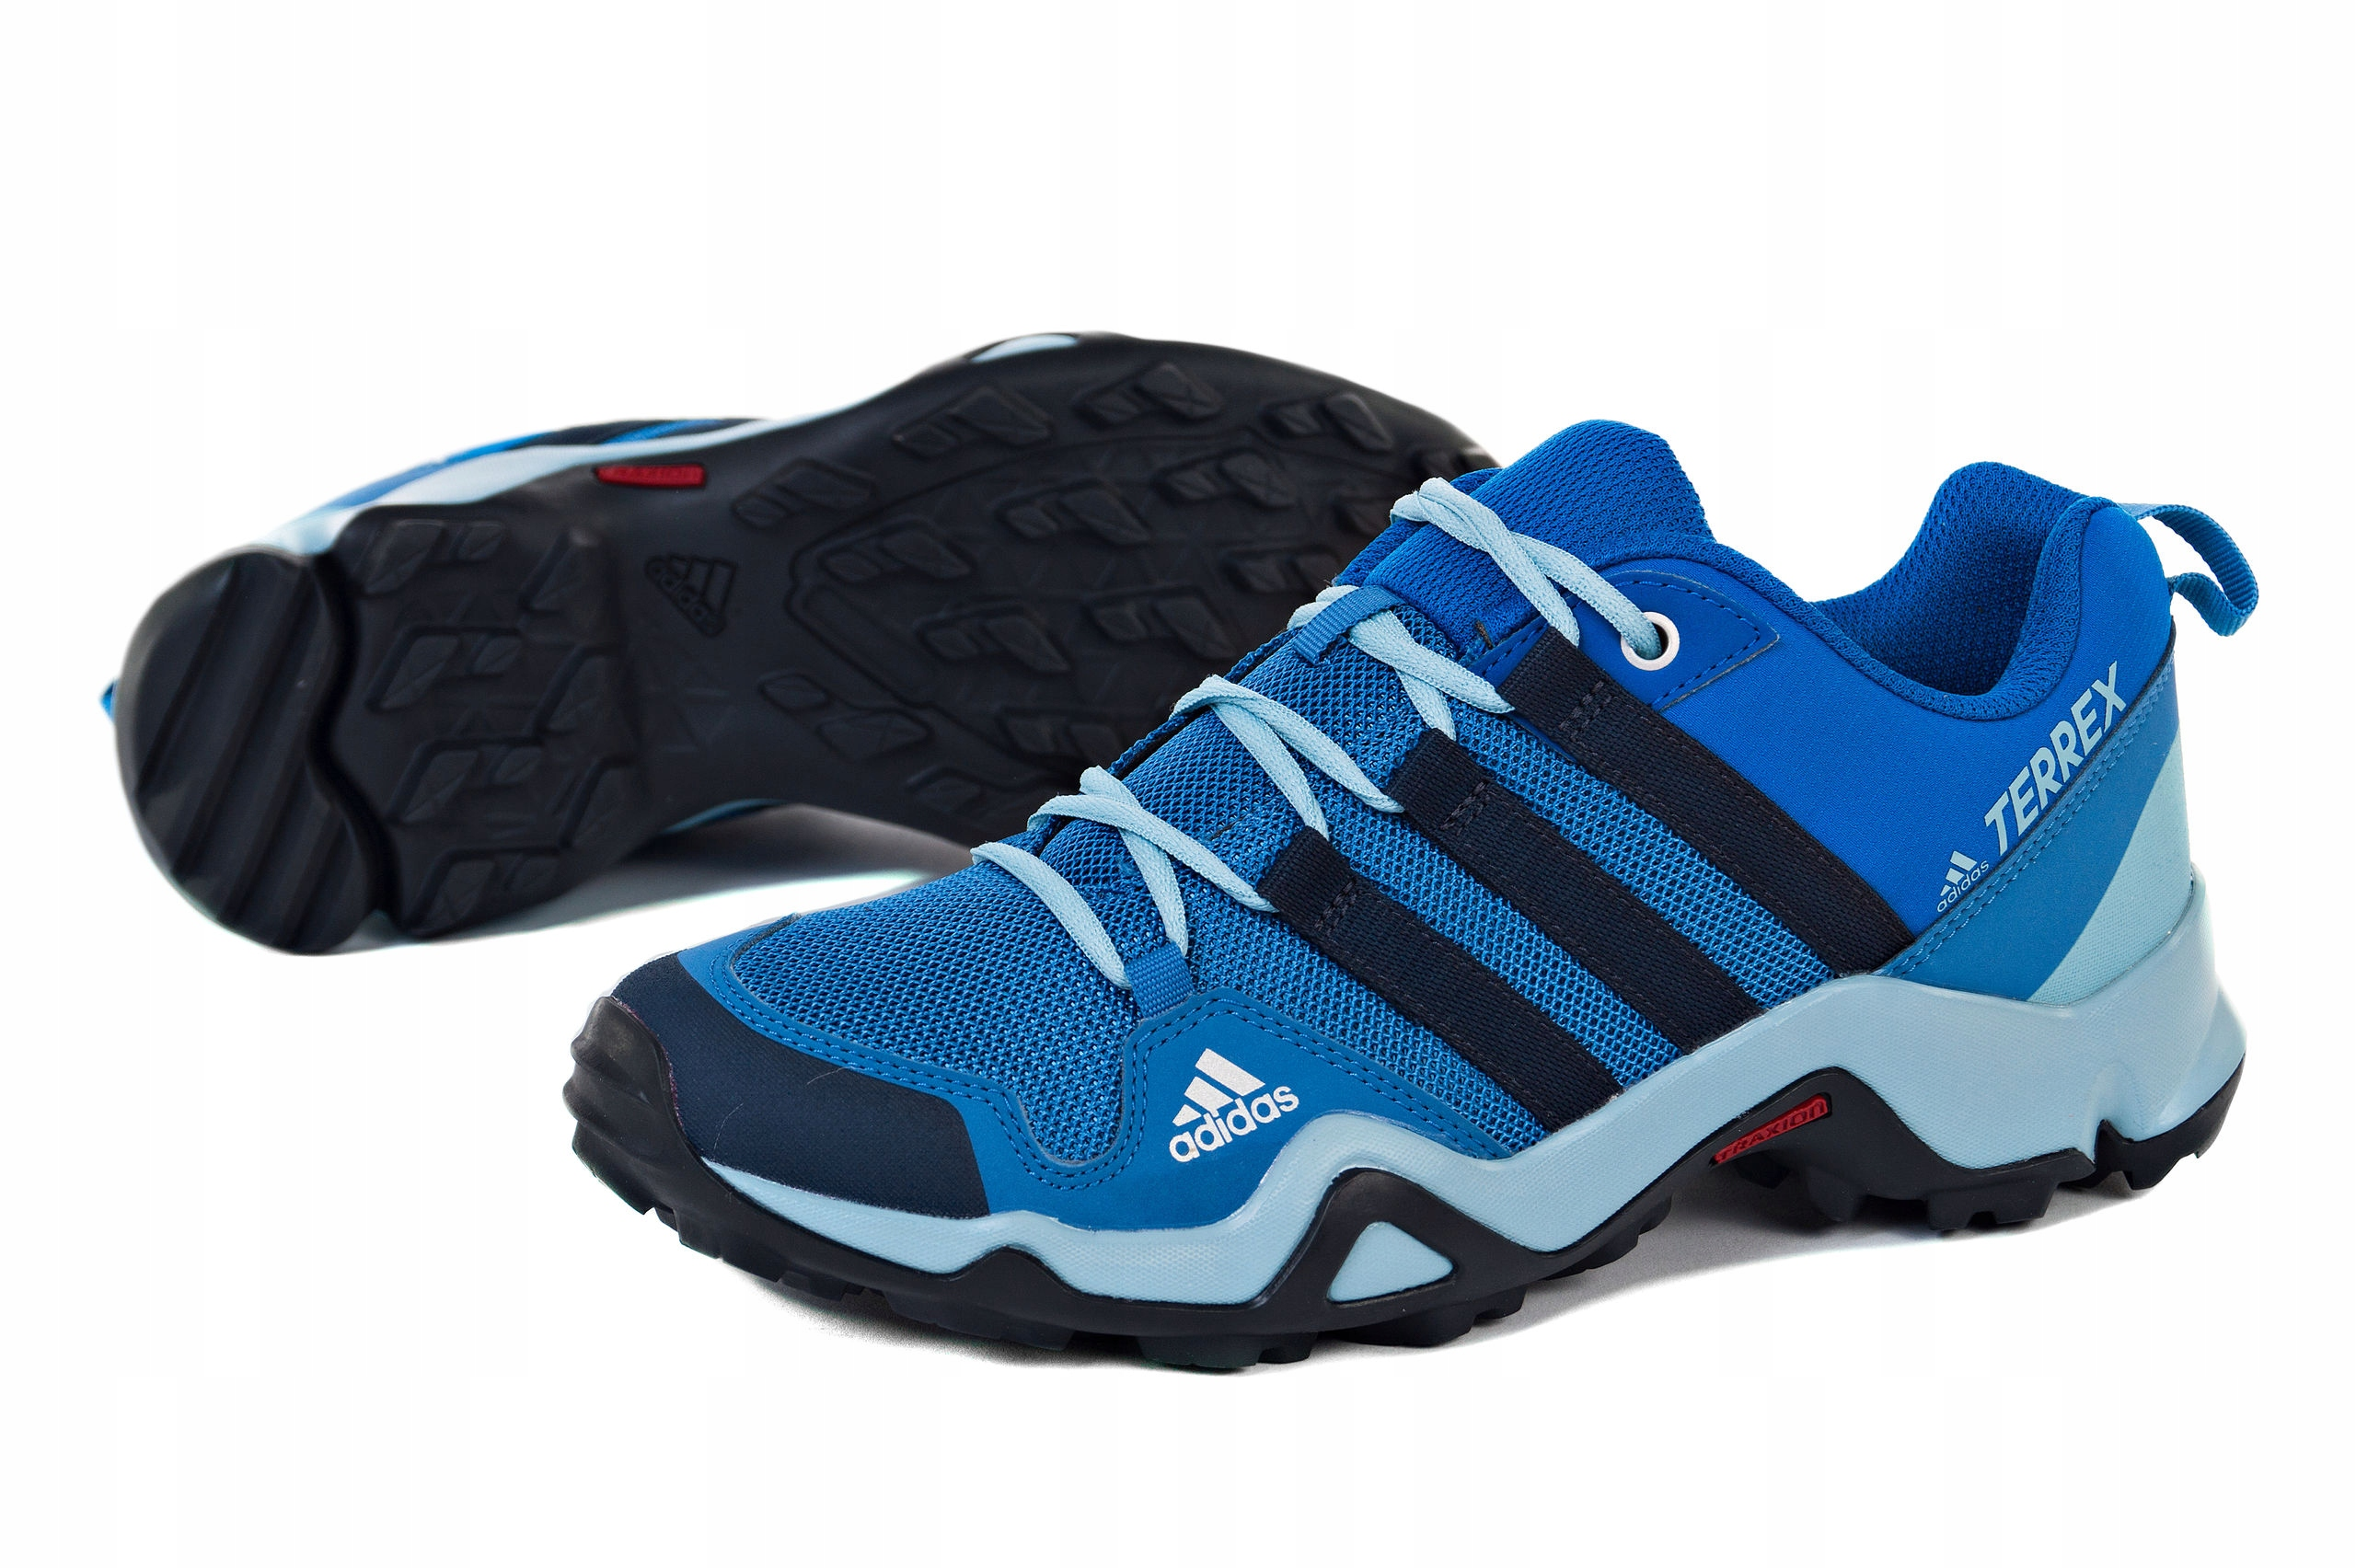 Adidas Trekking Buty Ax2r R38 Cm7677 7412727927 Terrex